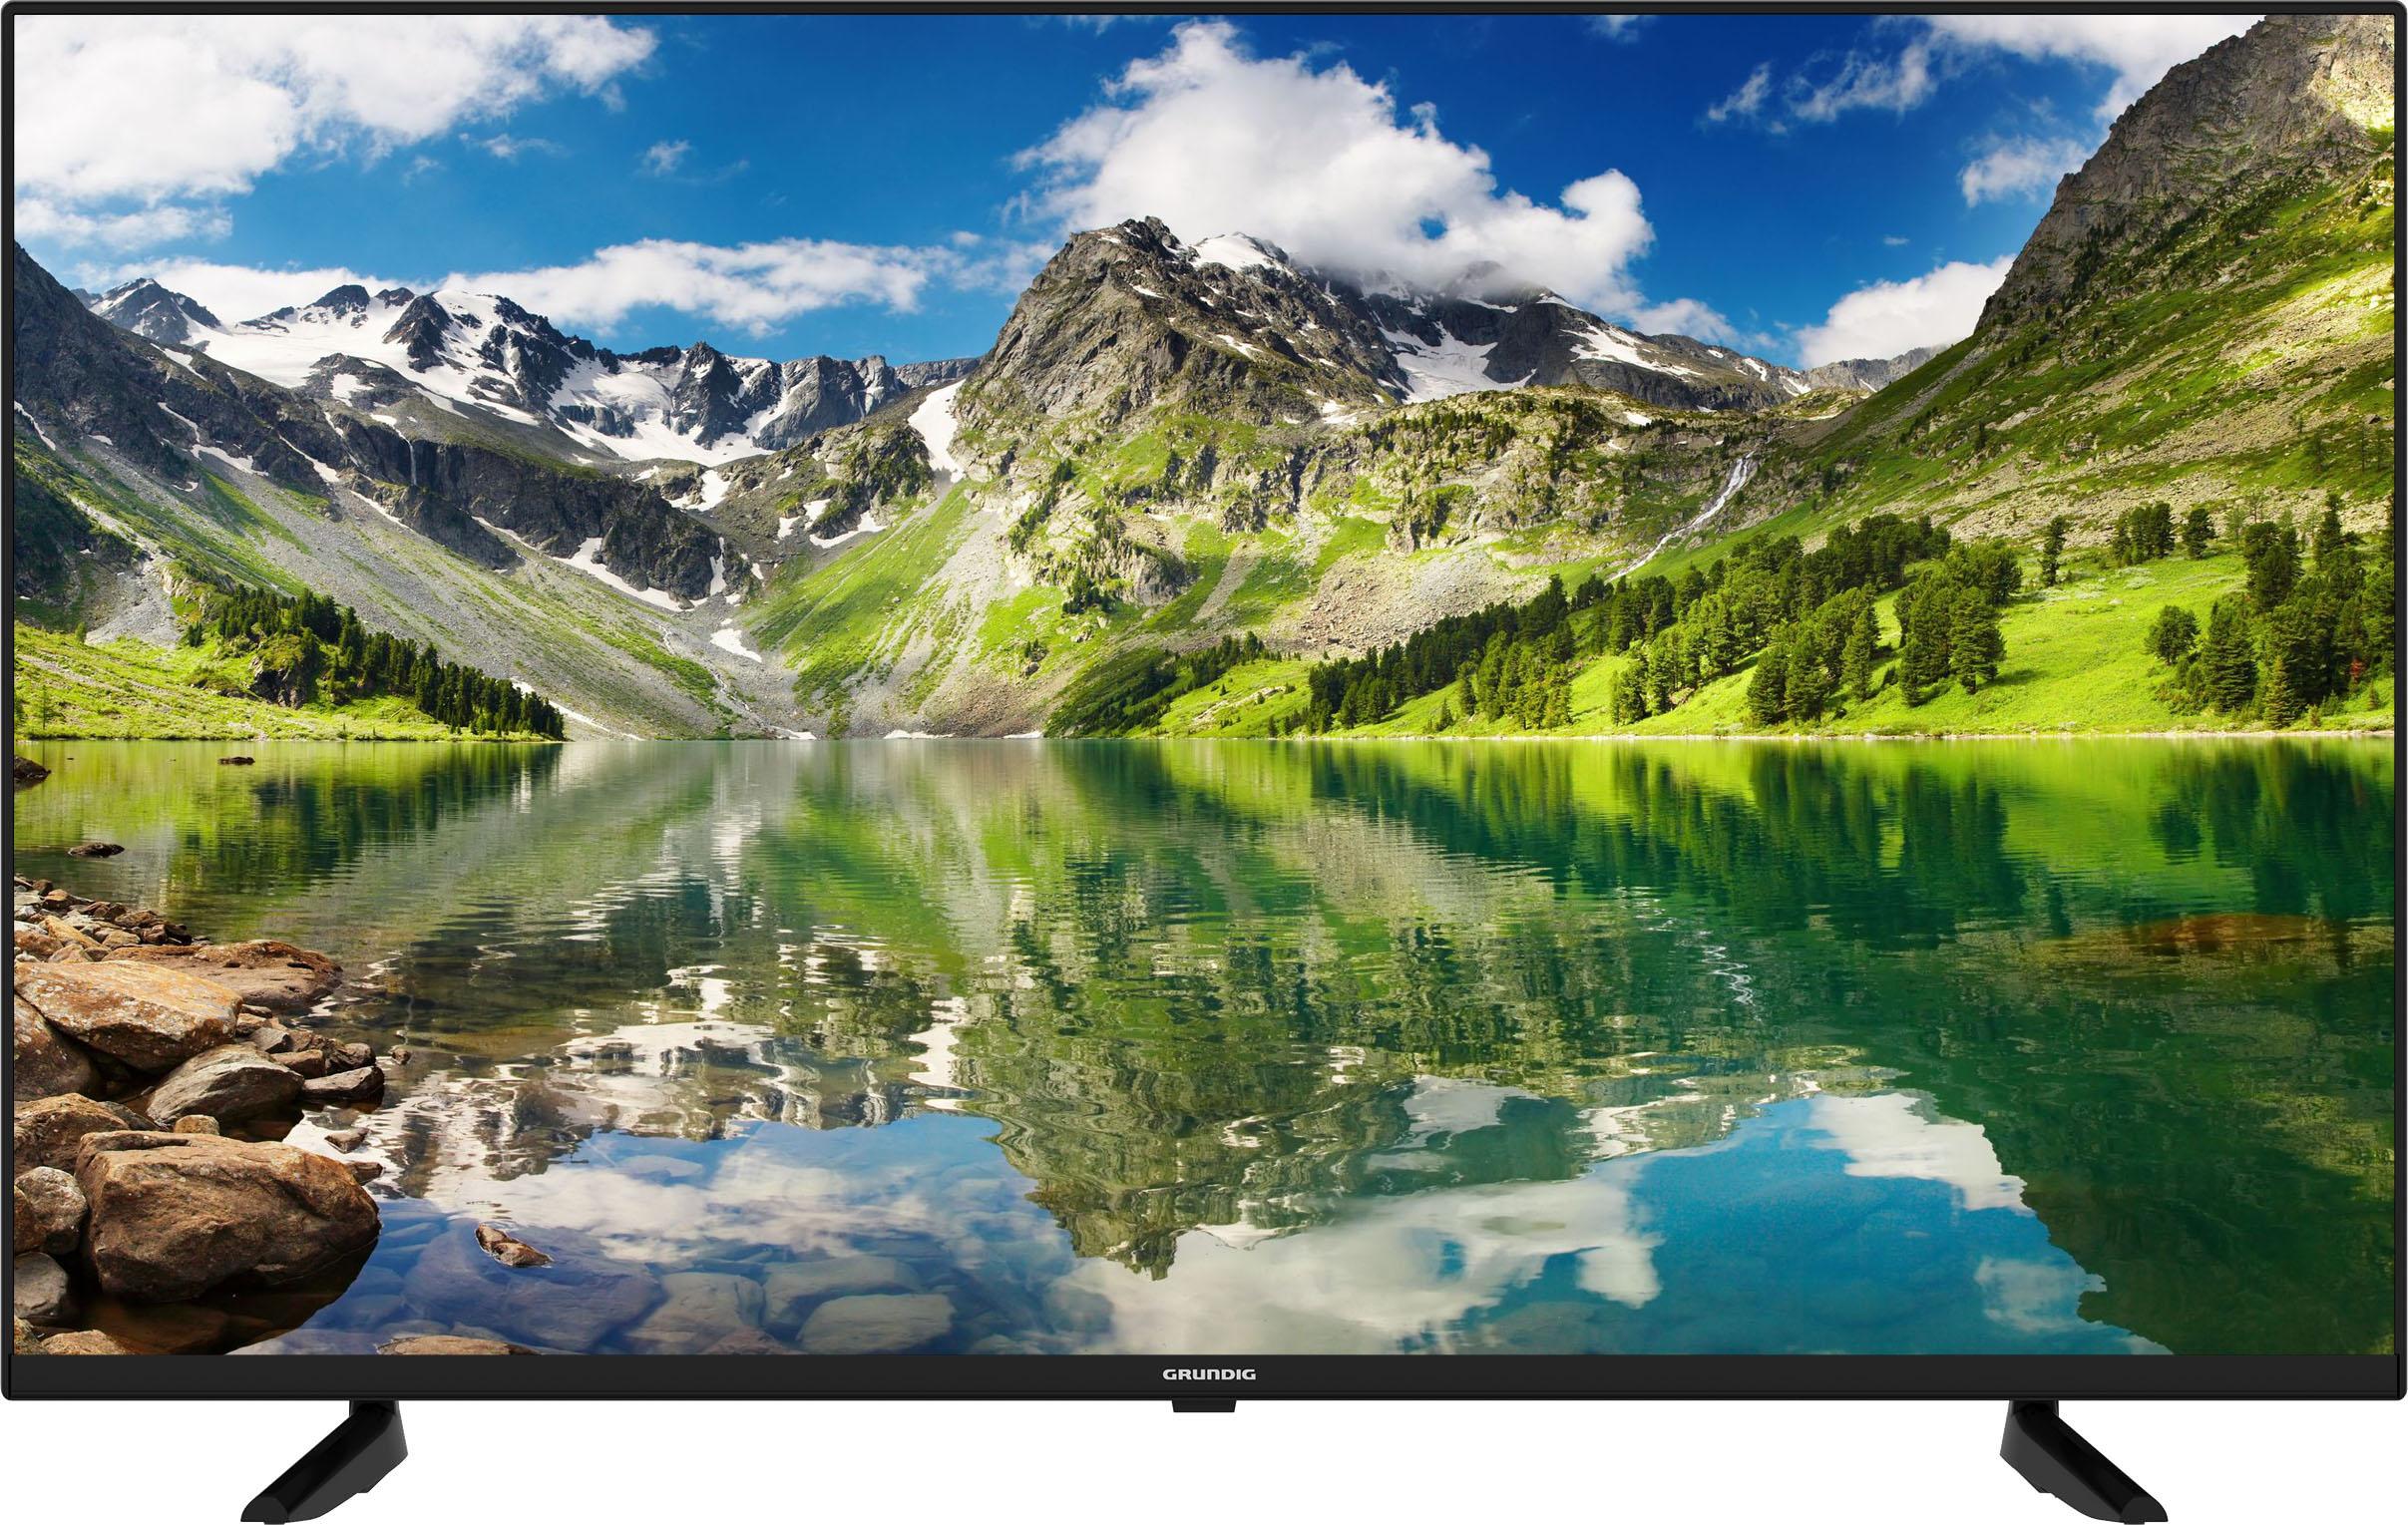 Grundig LED-Fernseher 50 VOE 20 UHT000 , 126 cm 50 , 4K Ultra HD, Smart-TV